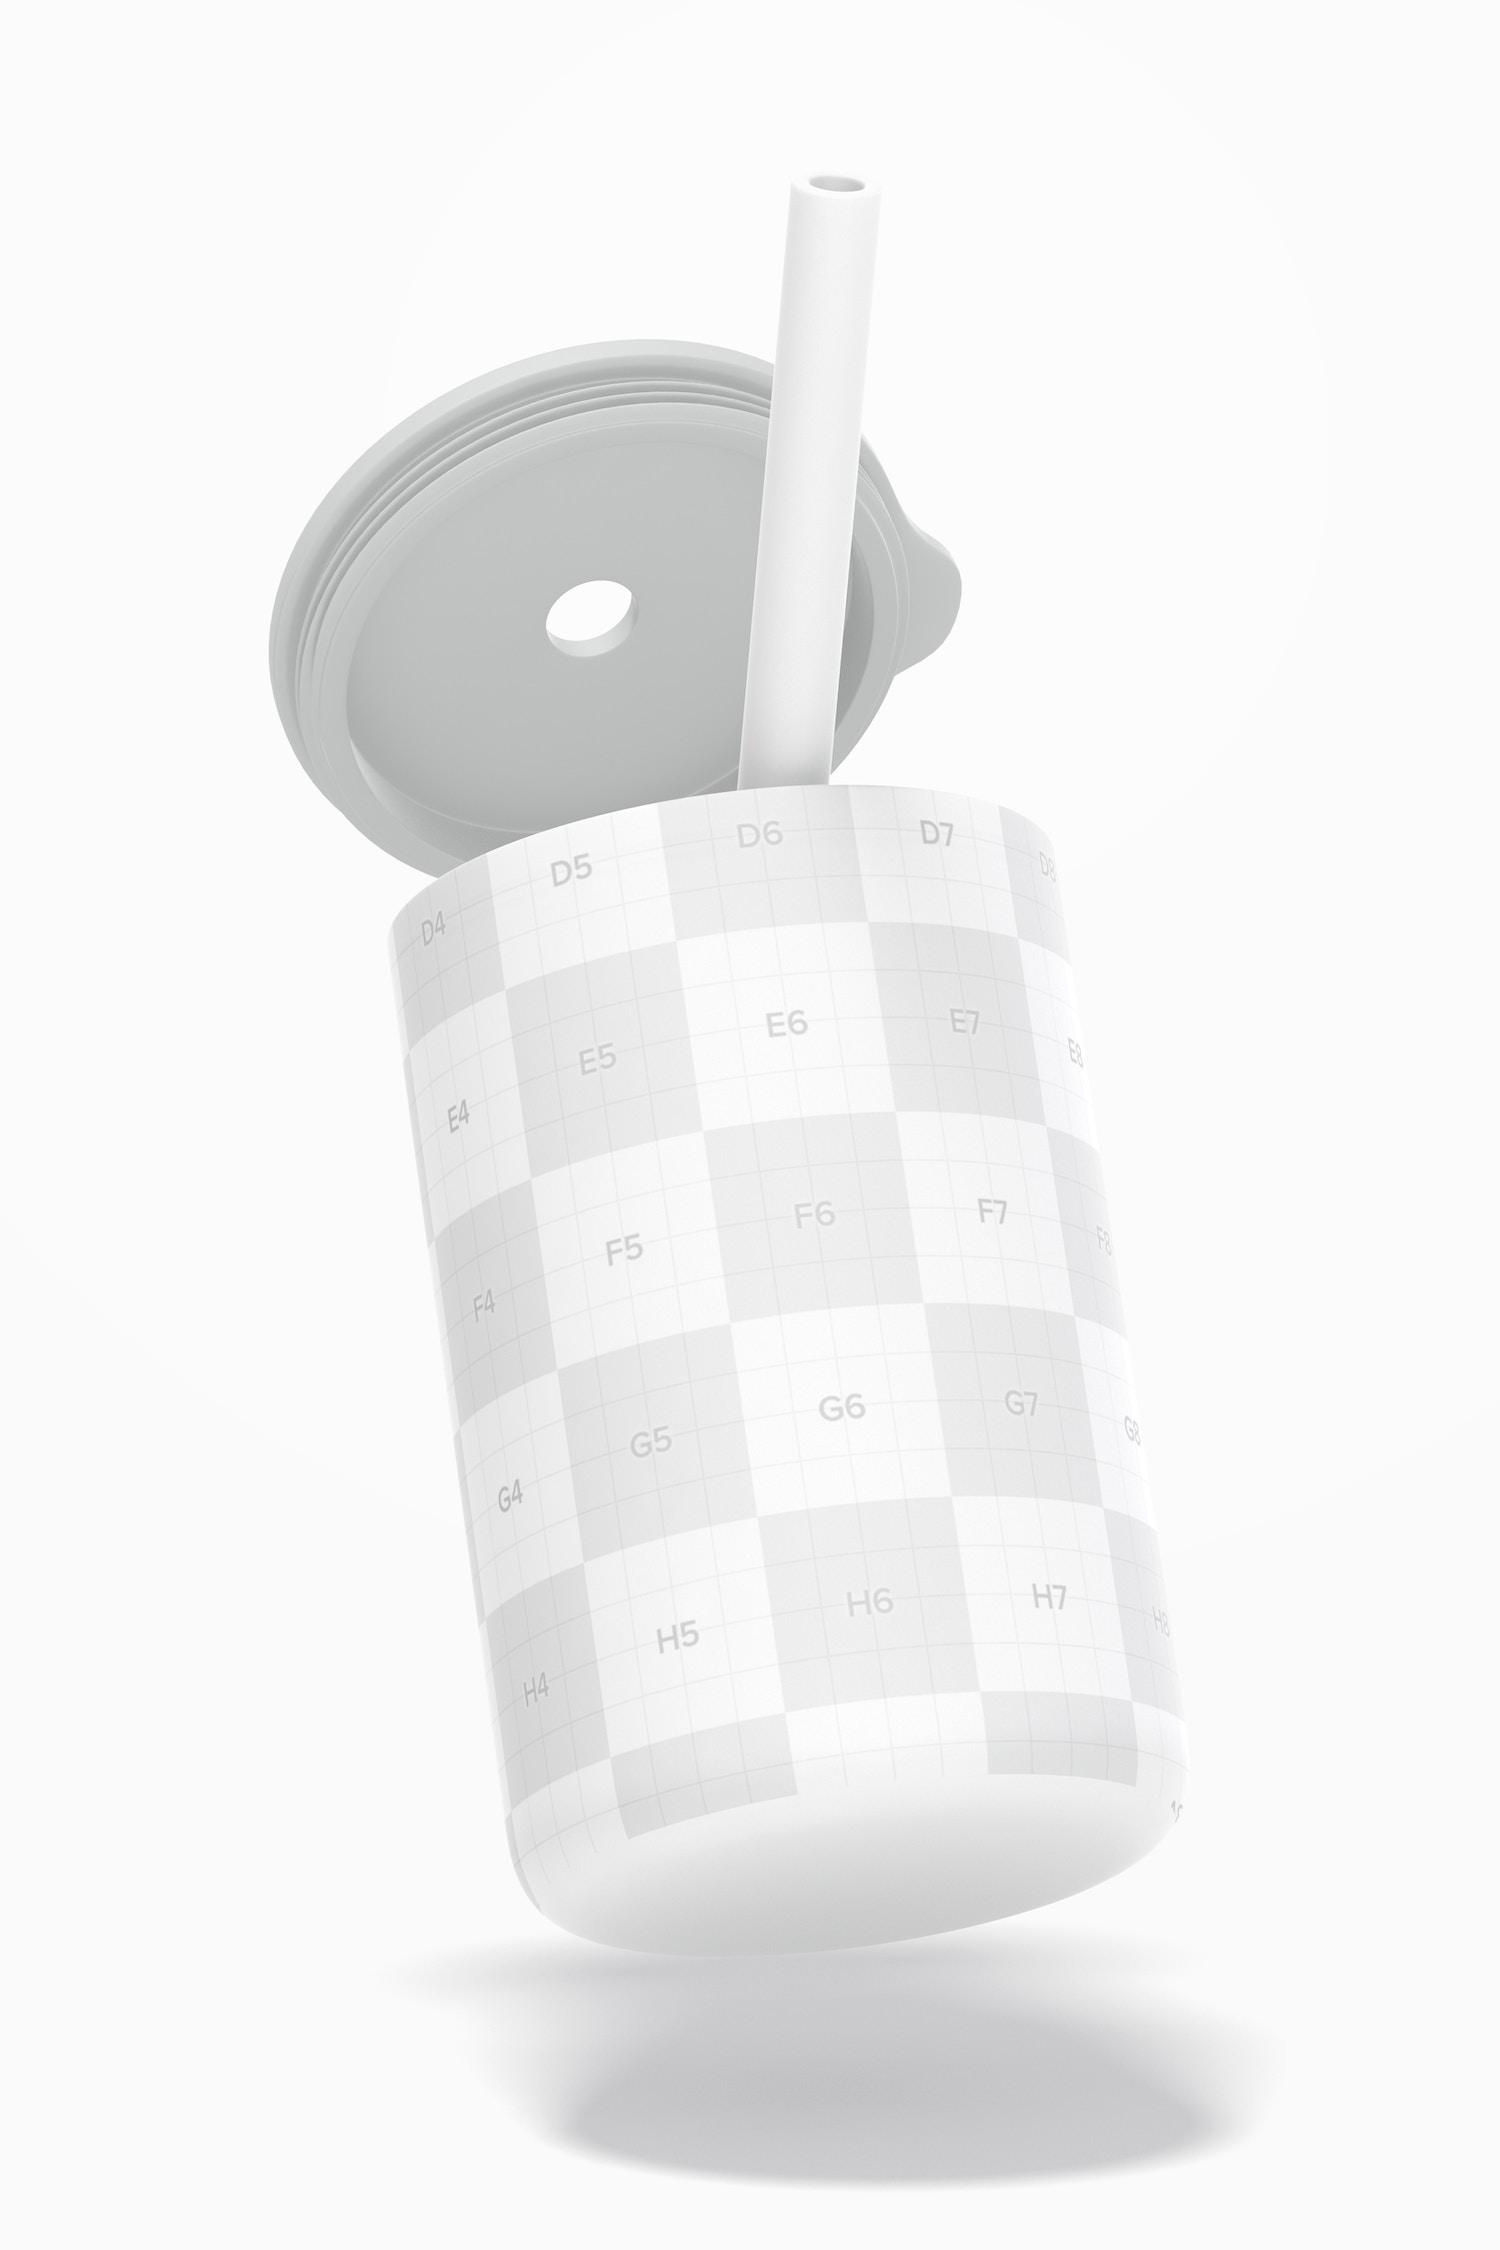 Silicone Baby Mug with Lid Mockup, Floating